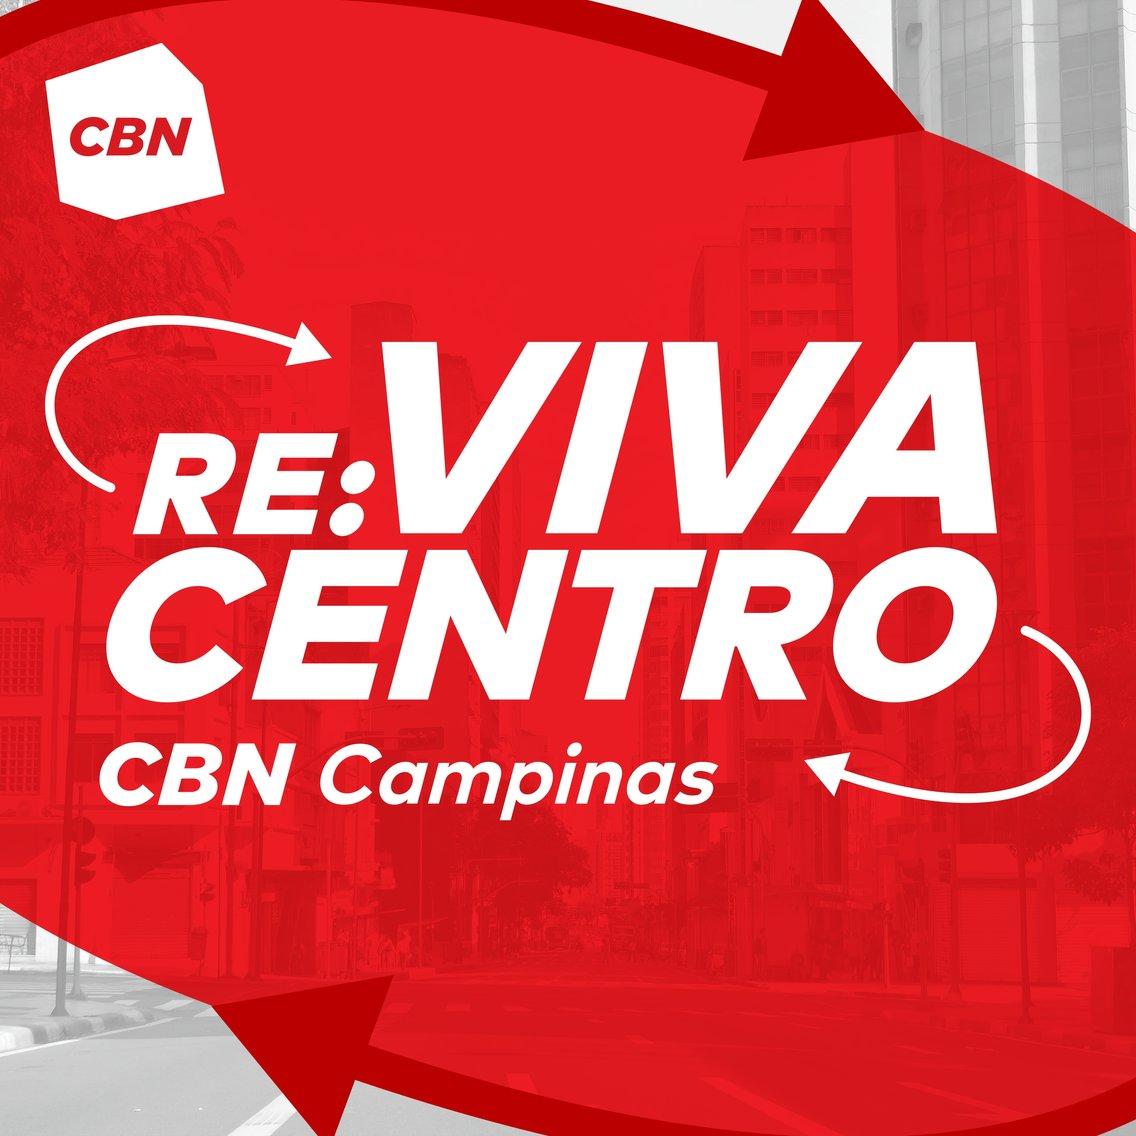 Reviva Centro Campinas - Cover Image